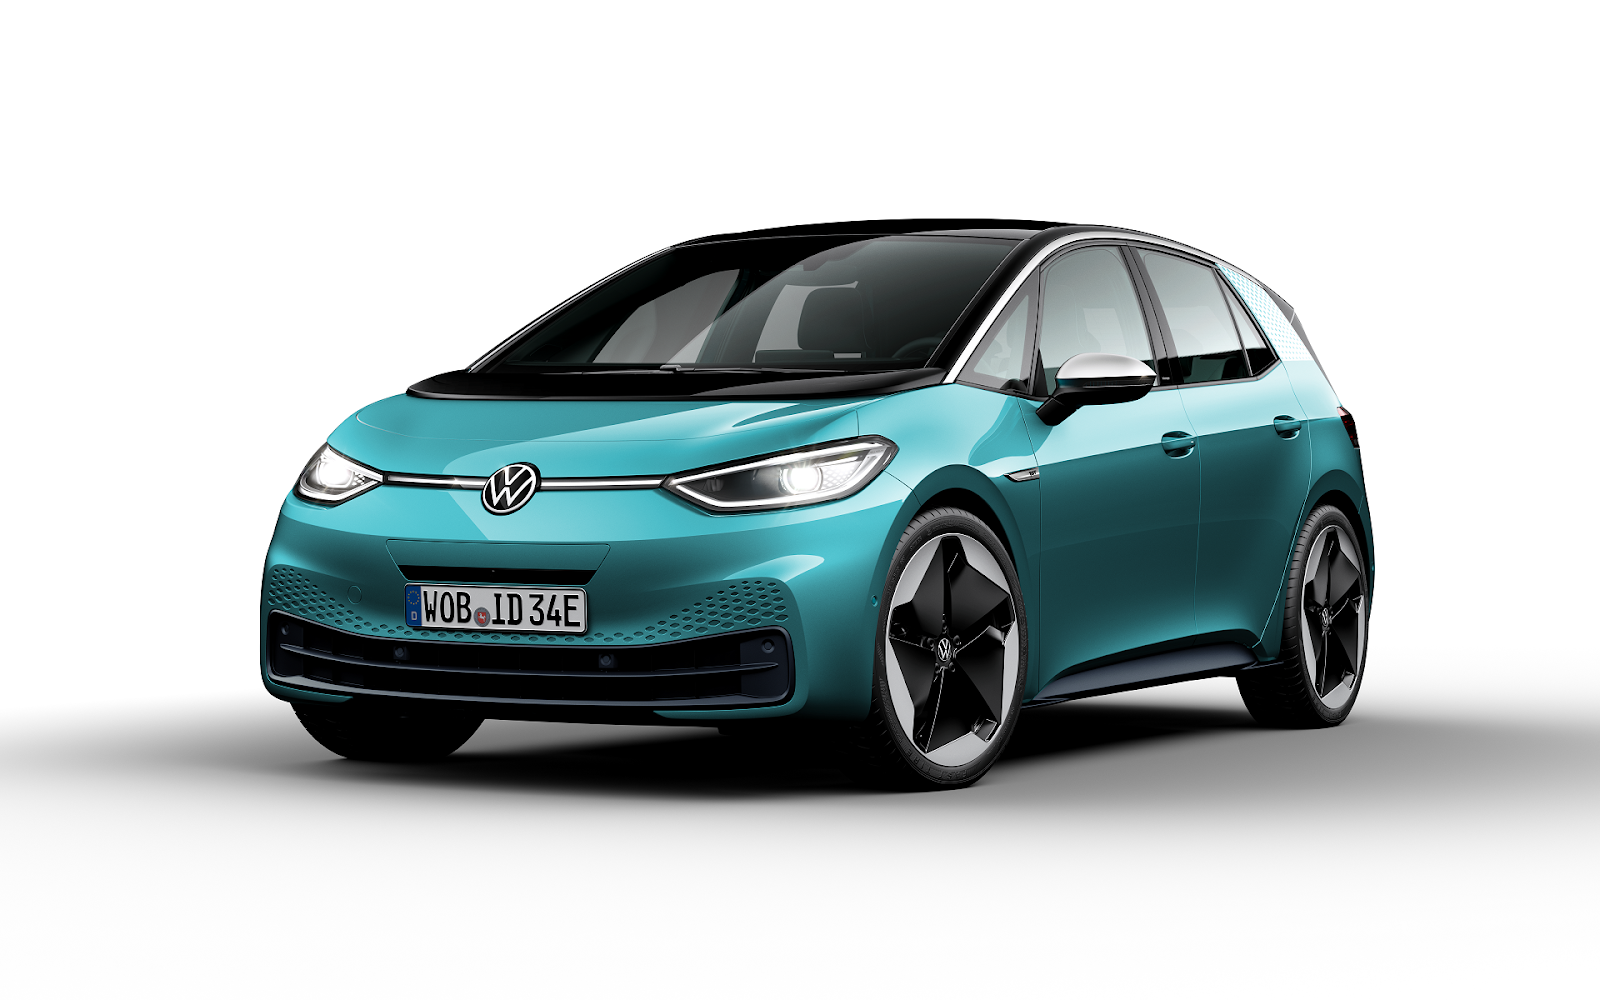 VOLKSWAGEN2BID.3 1 Γιατί το φθηνό ηλεκτρικό της Volkswagen αλλάζει την αυτοκίνηση Volkswagen, zblog, καινούργιο, καινούρια, καινούριο, Τεχνολογία, τιμες, ΦΩΤΟ, φωτογραφίες